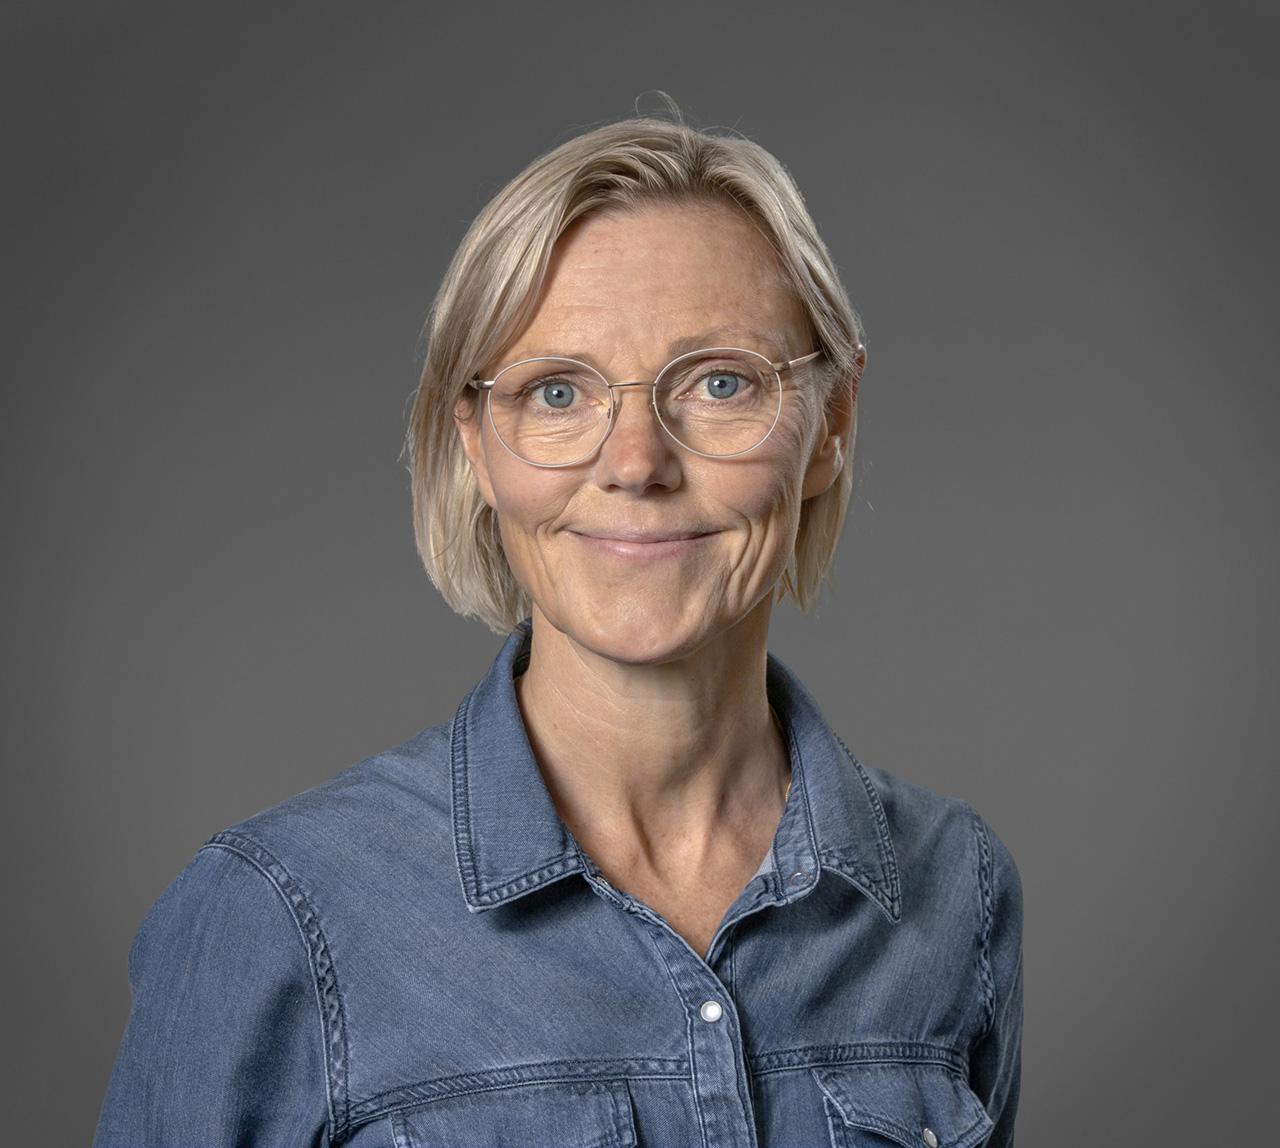 Annika Ekeståhl